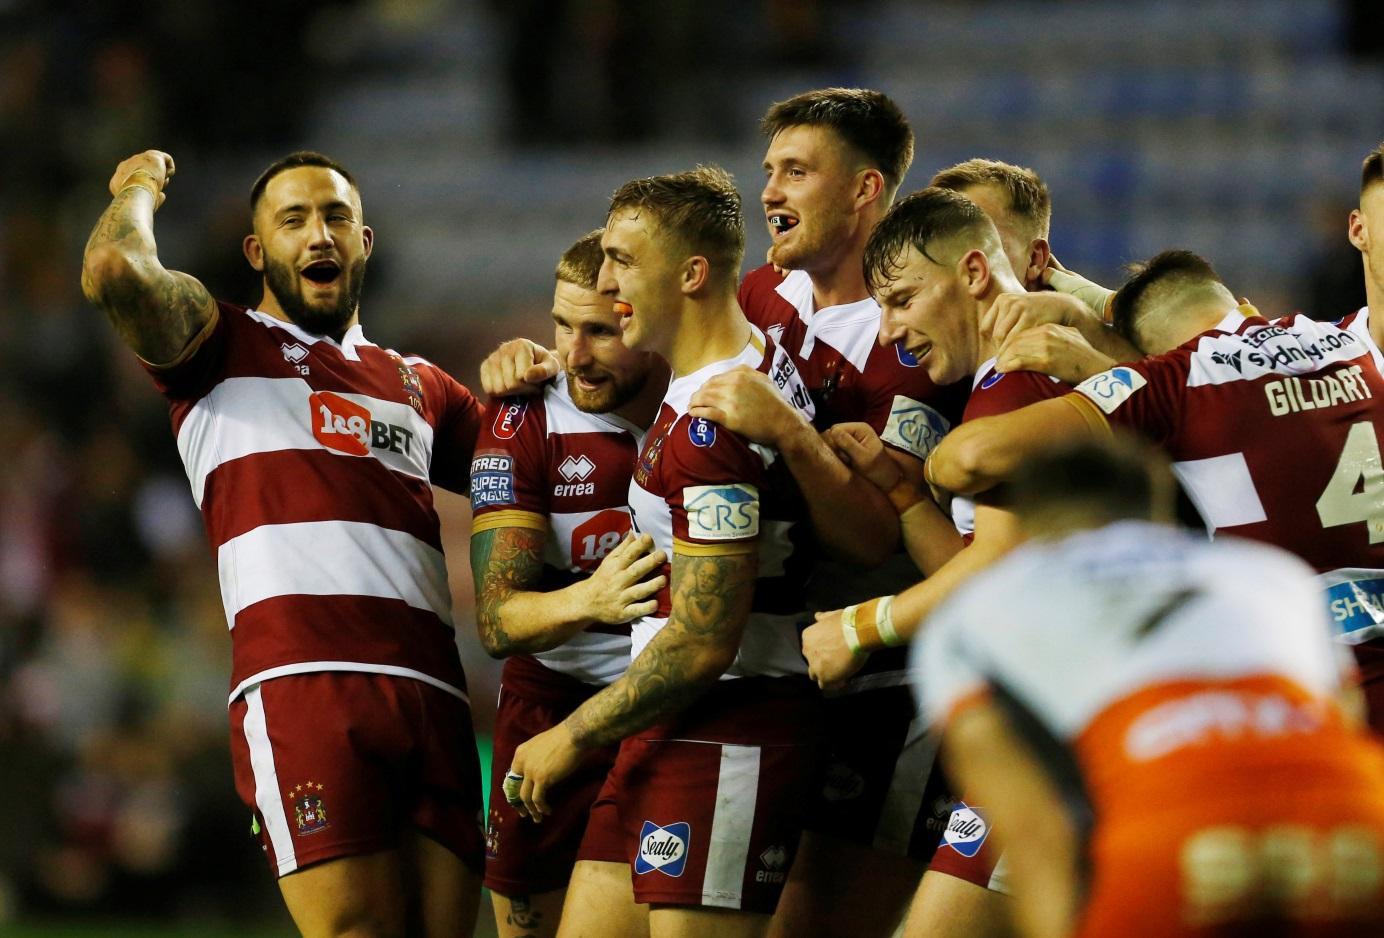 Lam Targeting New Era With Wigan